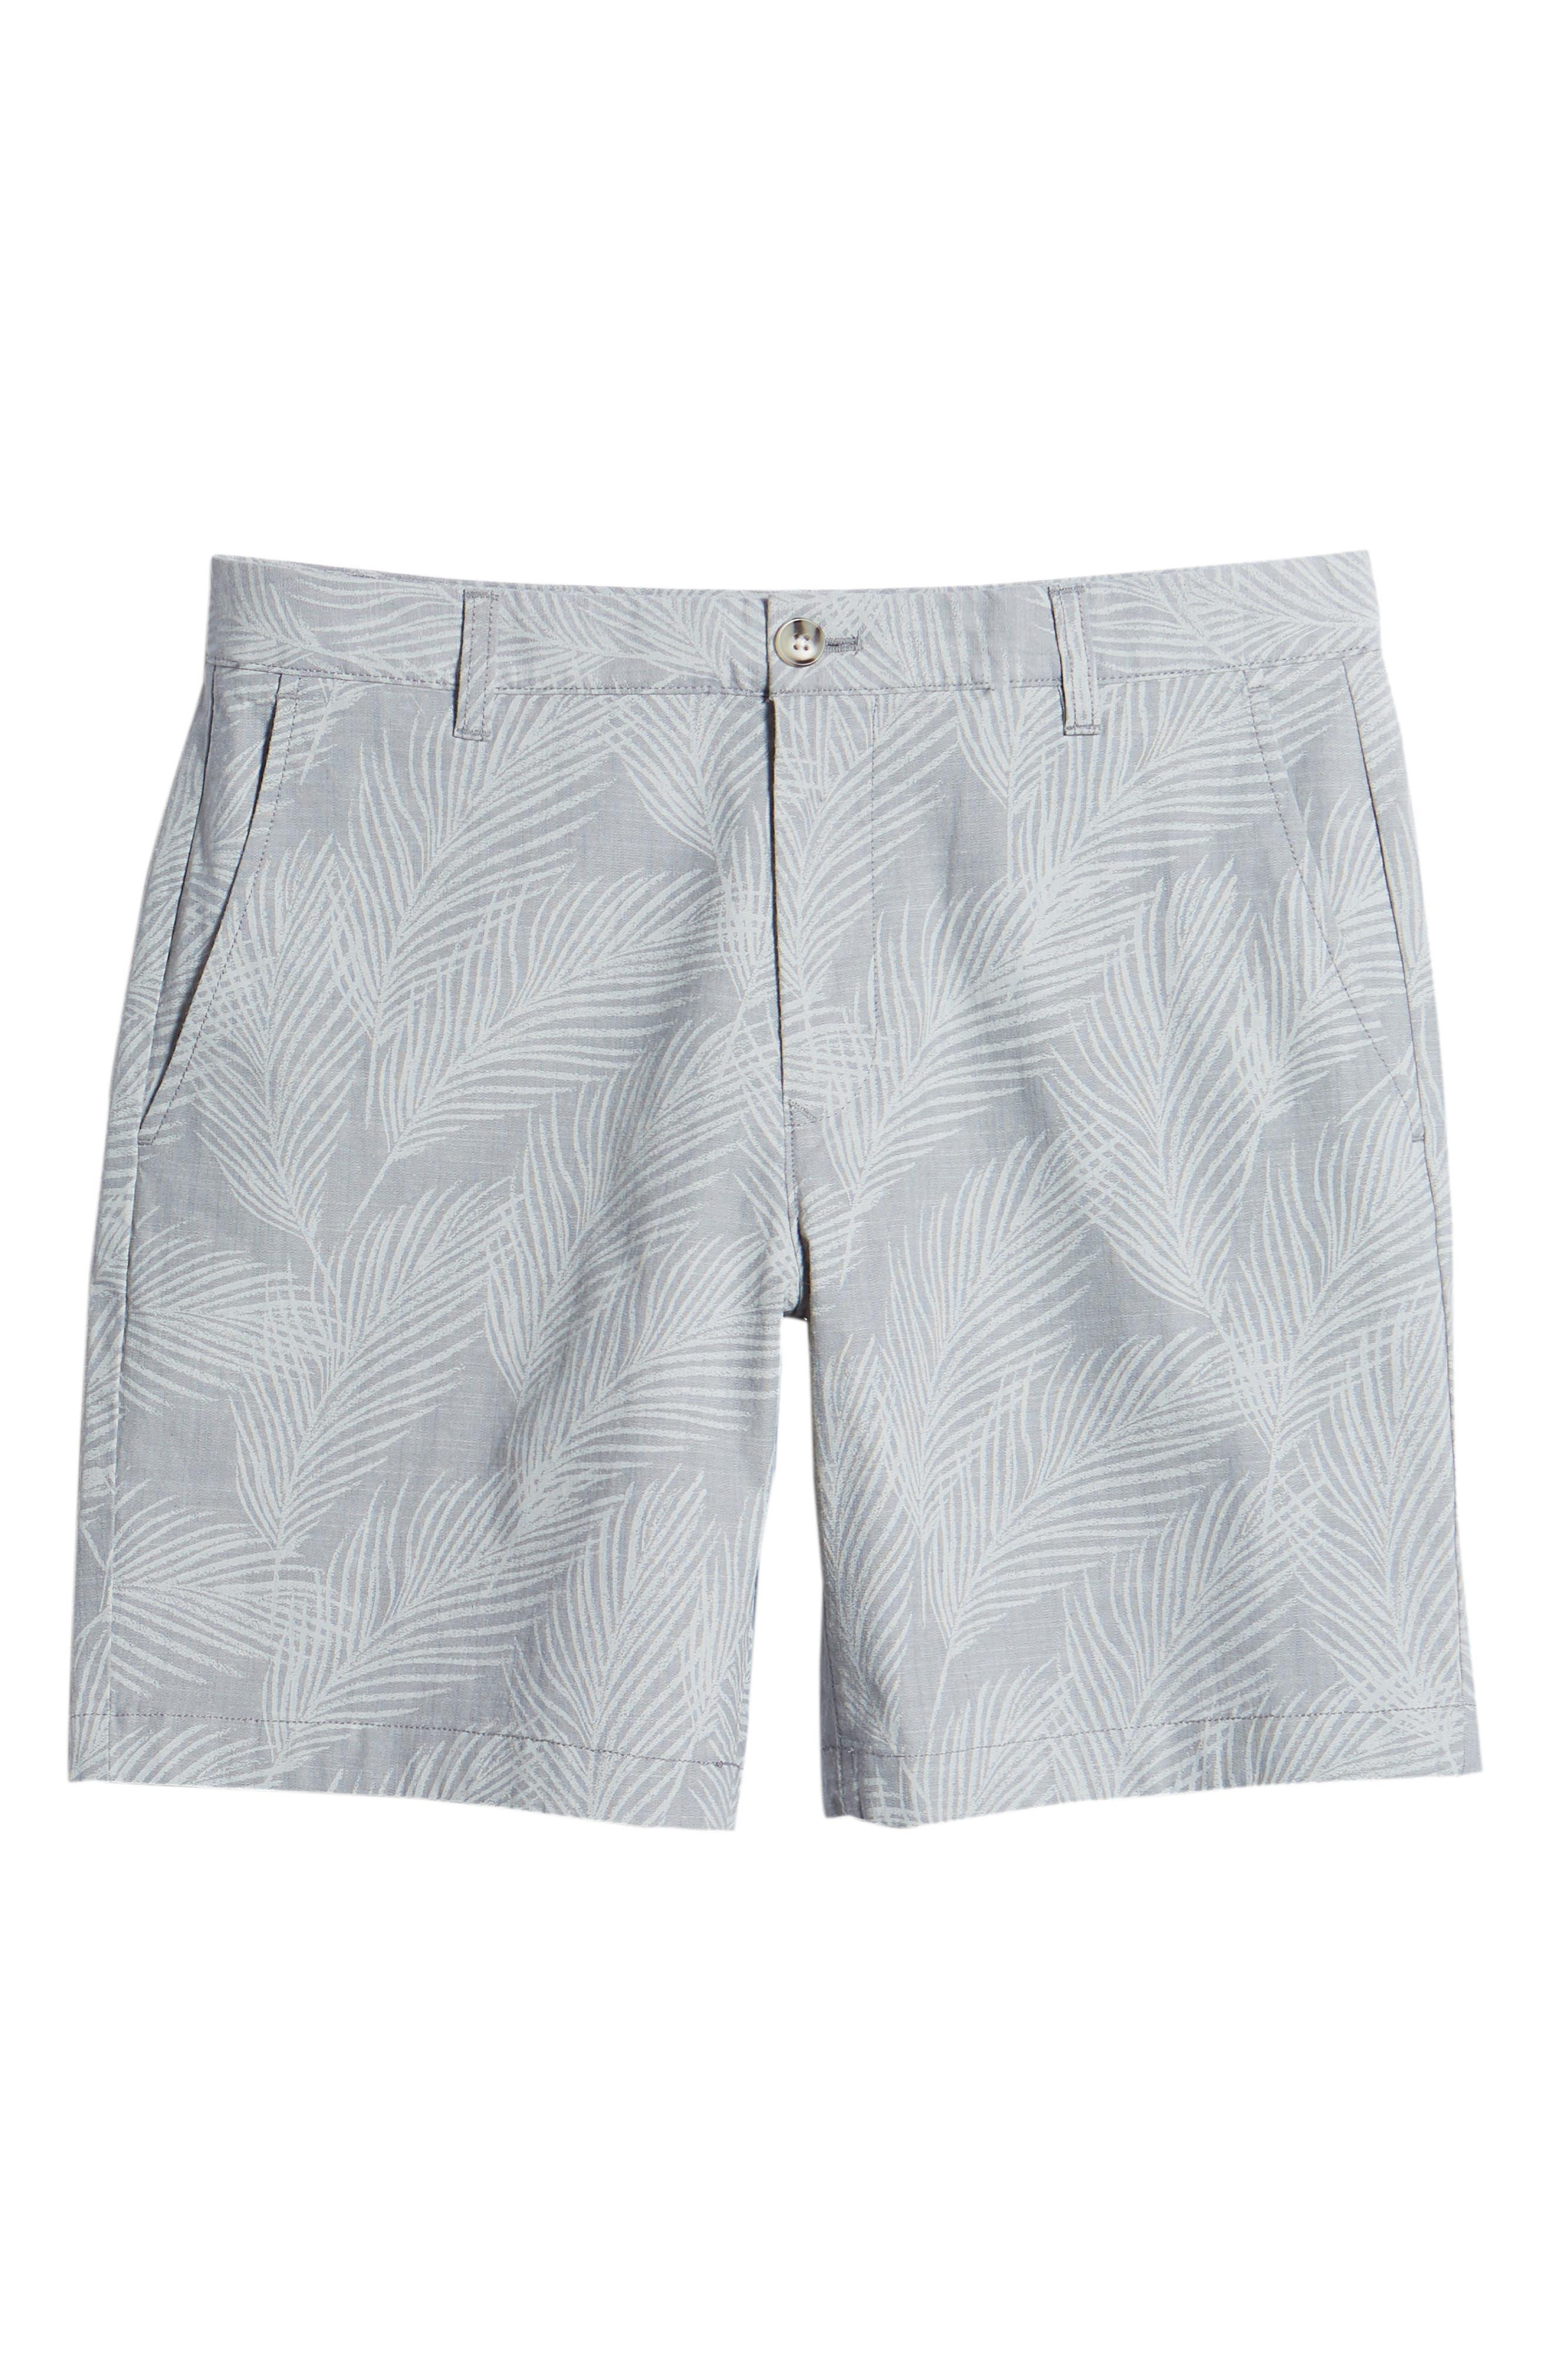 Print Stretch Chino Shorts,                             Alternate thumbnail 6, color,                             Breezy Palms Chambray